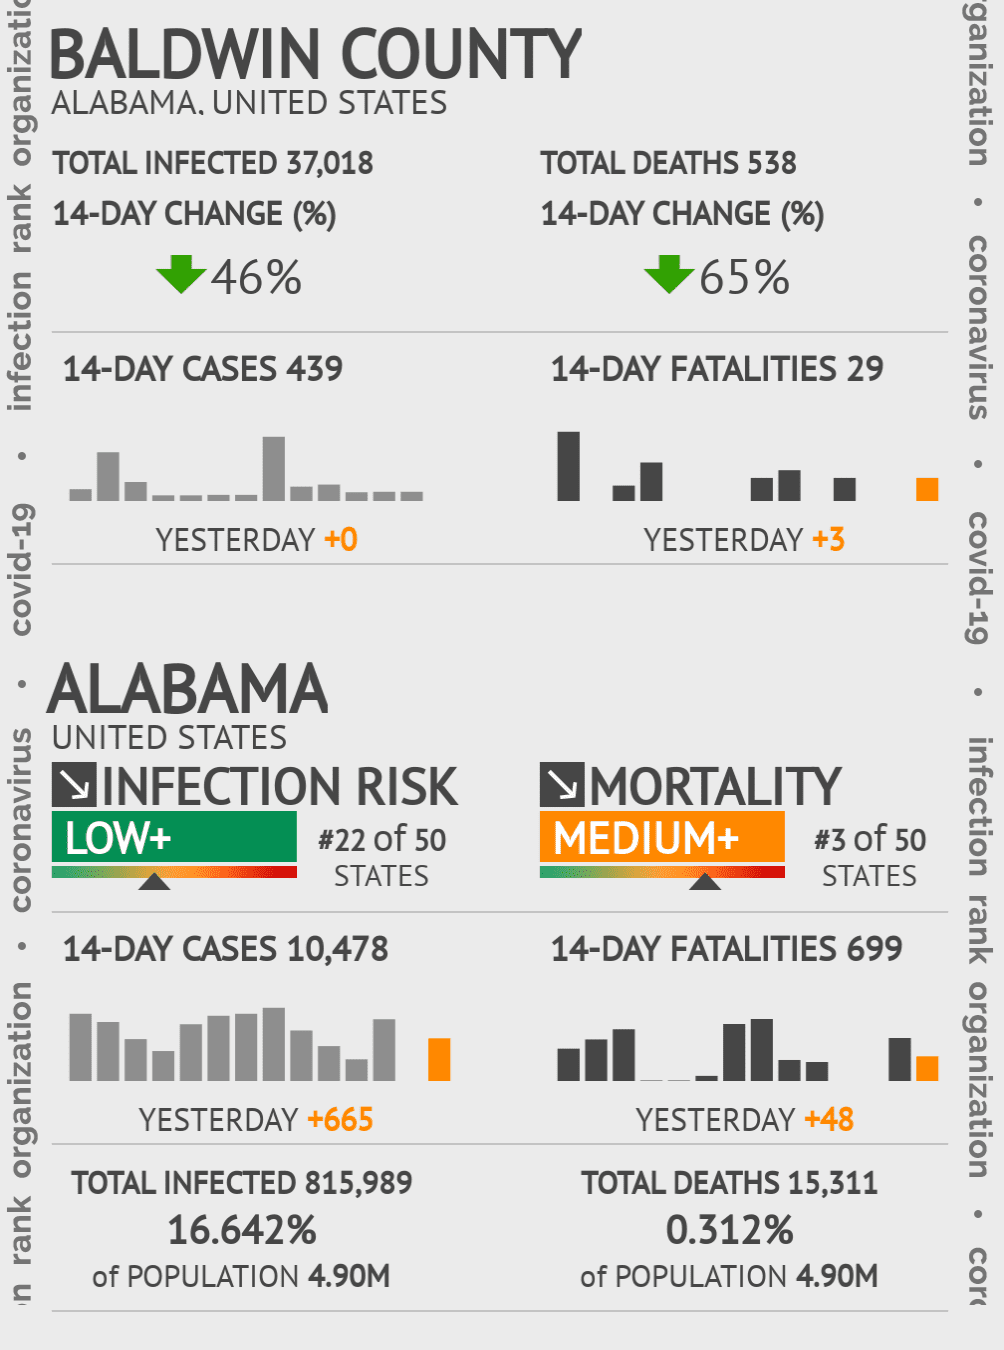 Baldwin County Coronavirus Covid-19 Risk of Infection on July 24, 2021